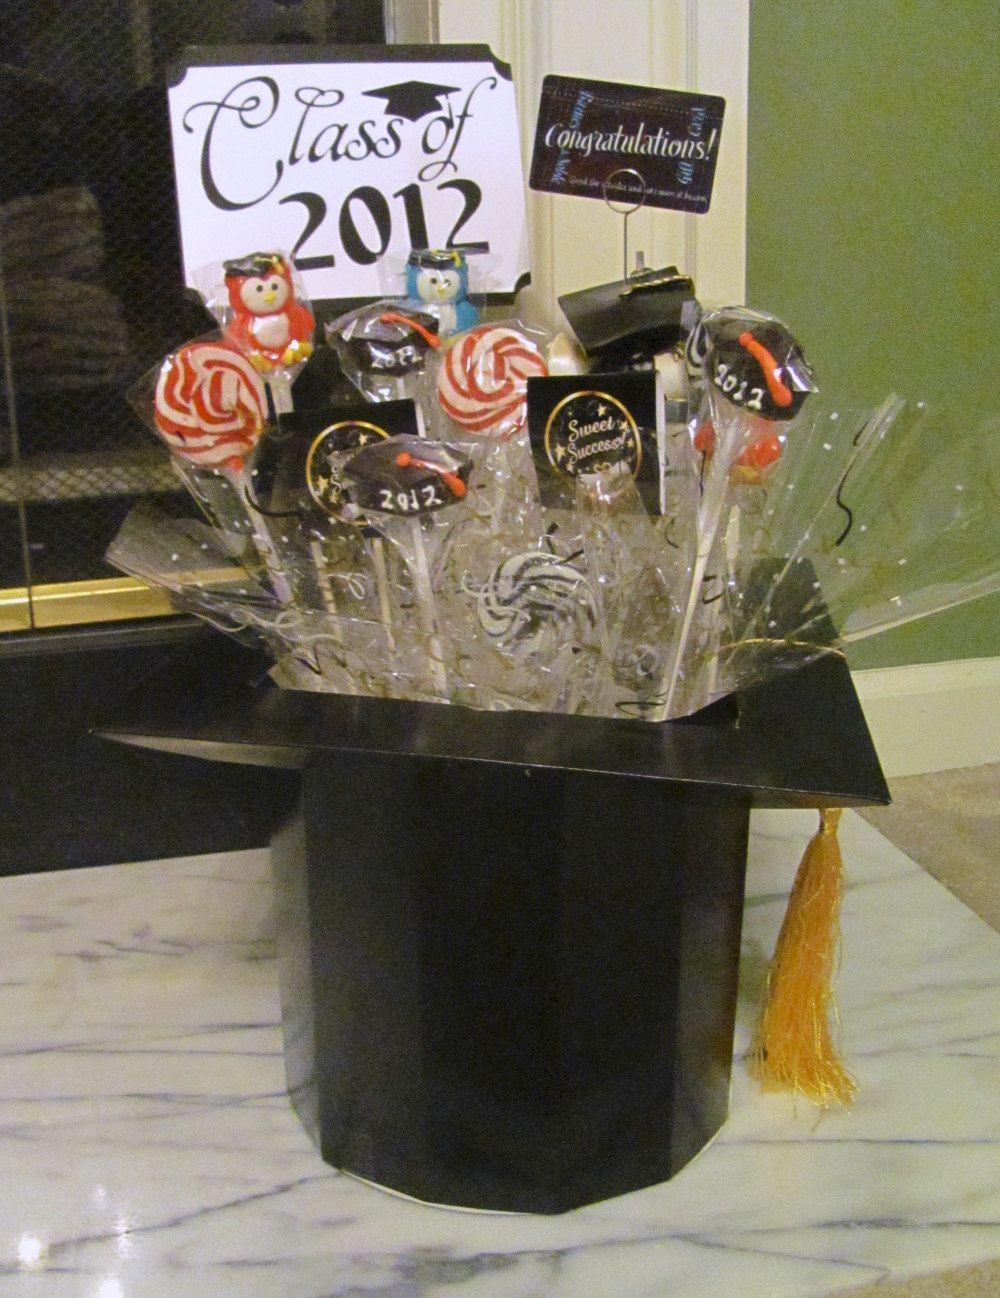 Graduation candy centerpiece featuring mortar board box